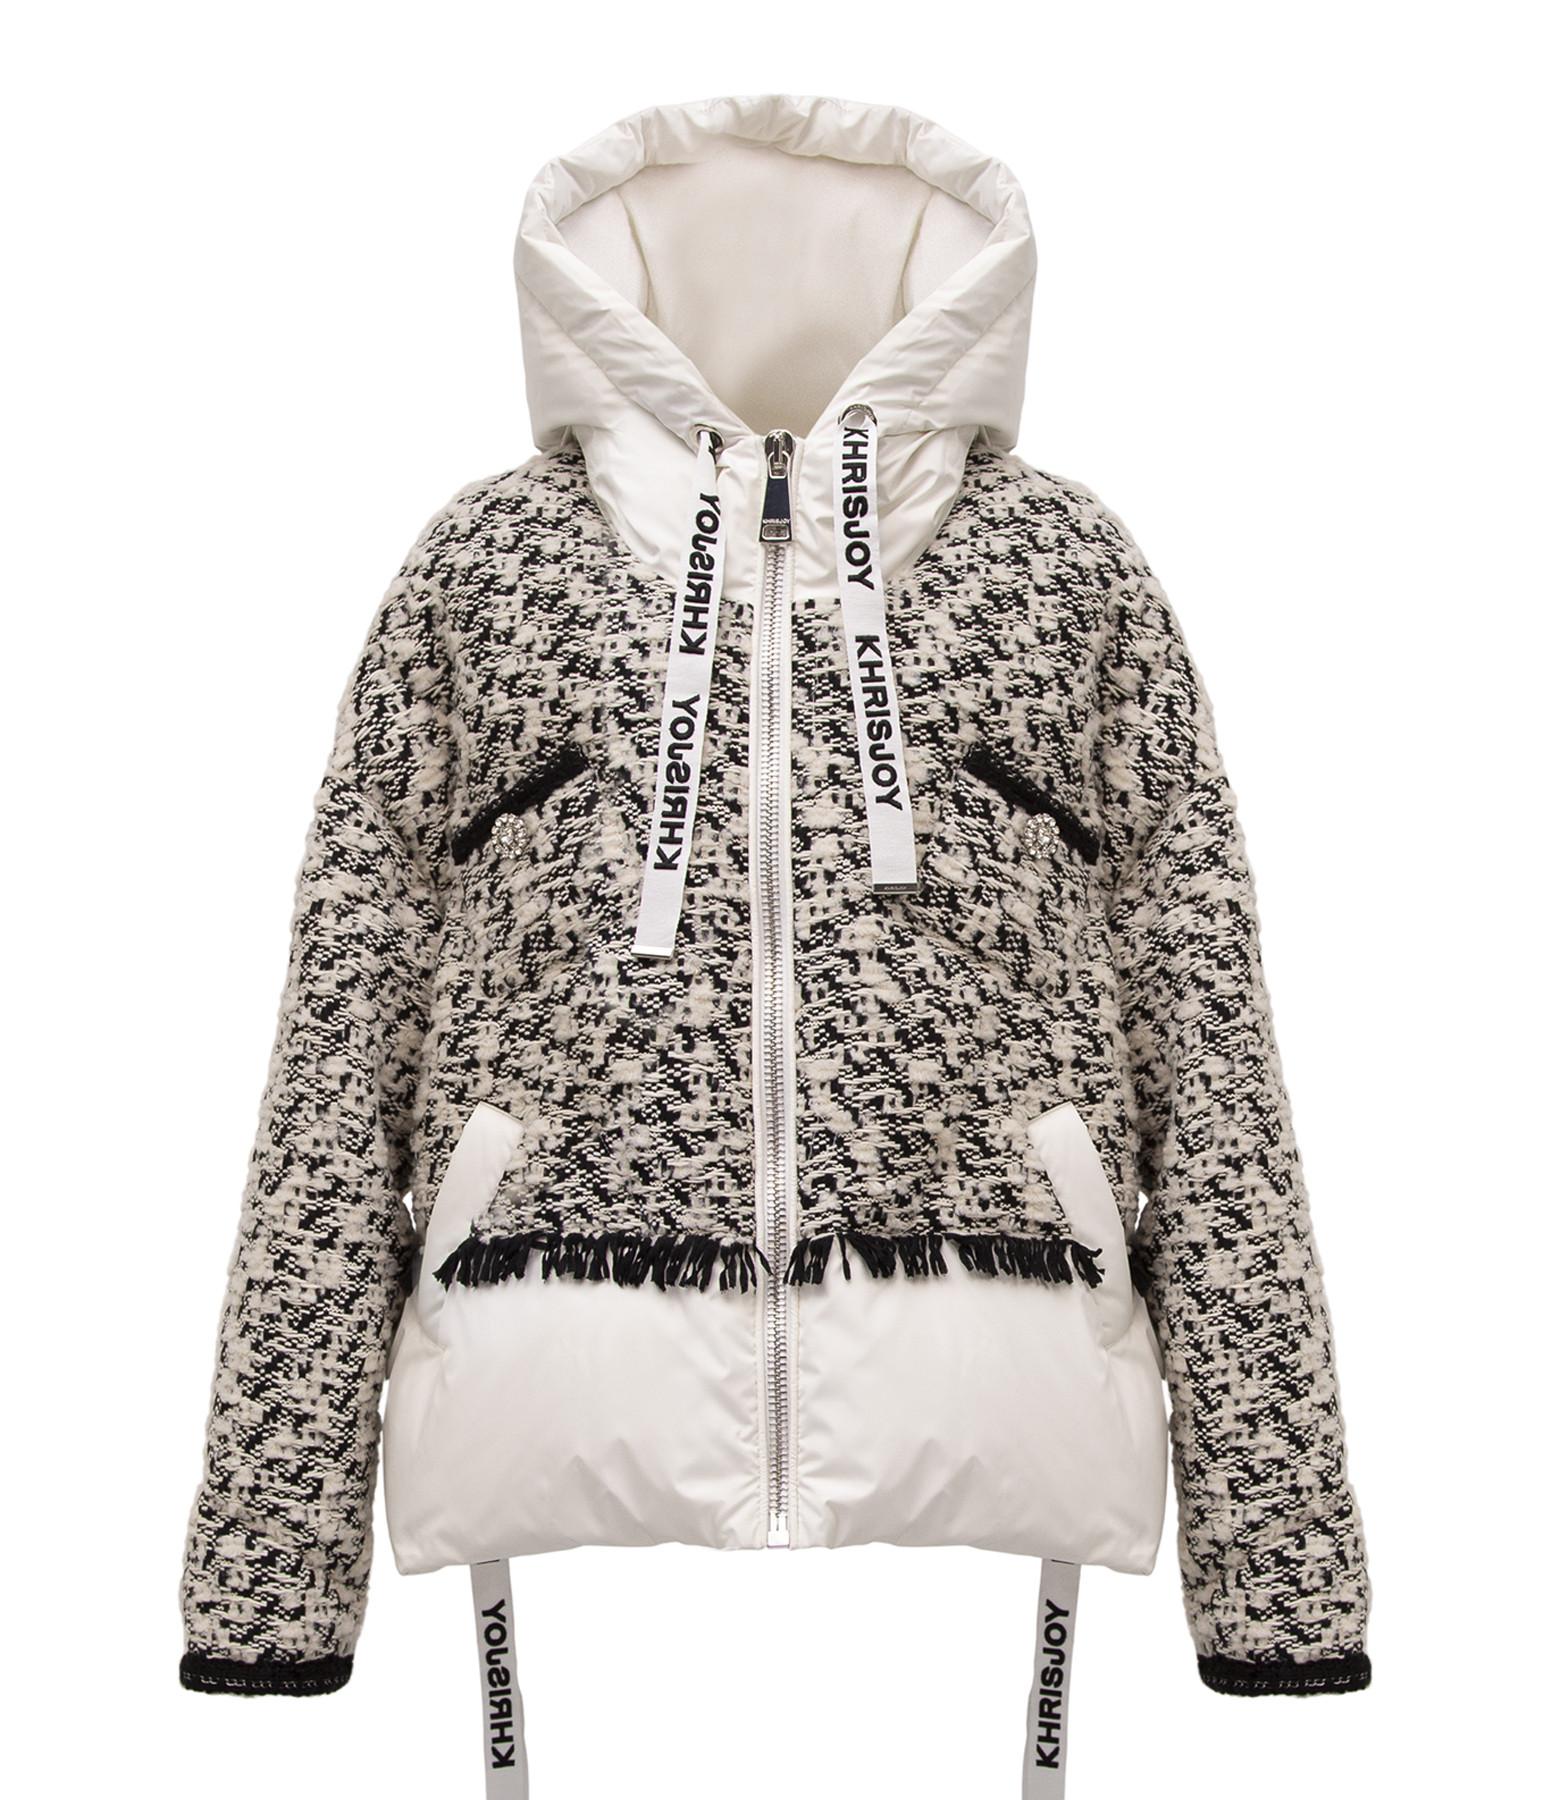 KHRISJOY - Veste Doudoune Khris Tweed Noir Blanc